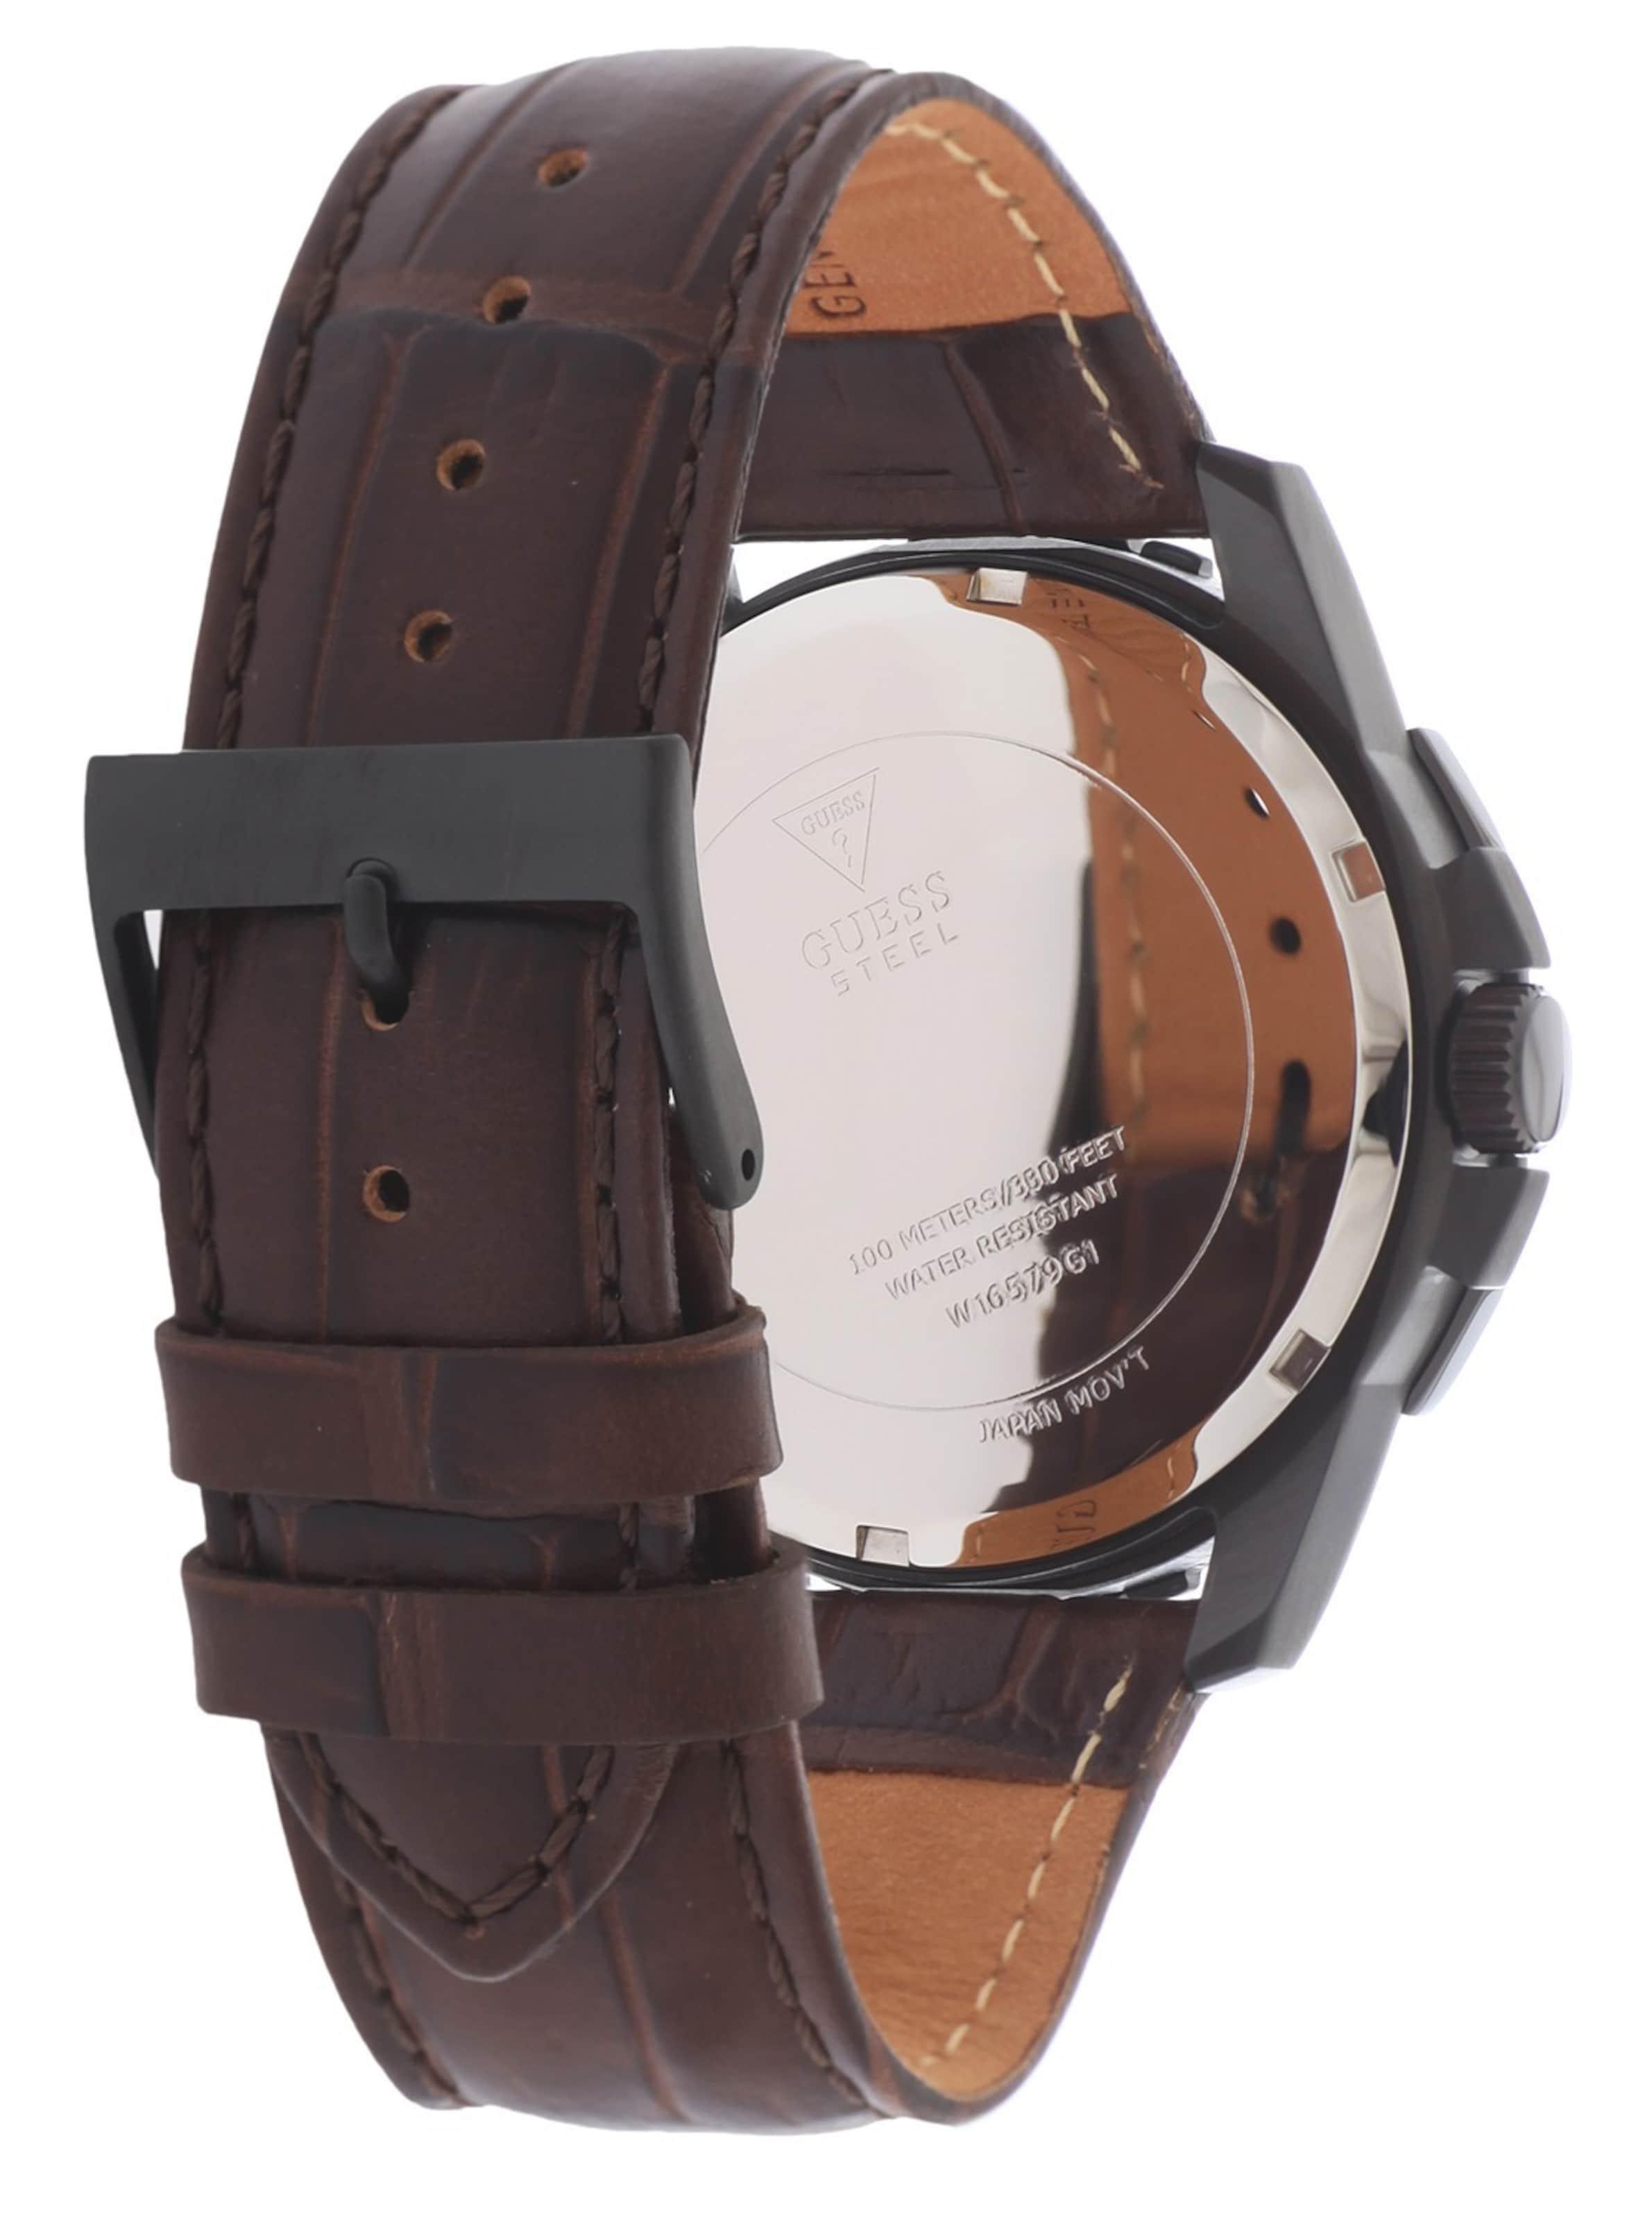 GUESS Armbanduhr 2018 Unisex Günstiger Preis C7lSjdX